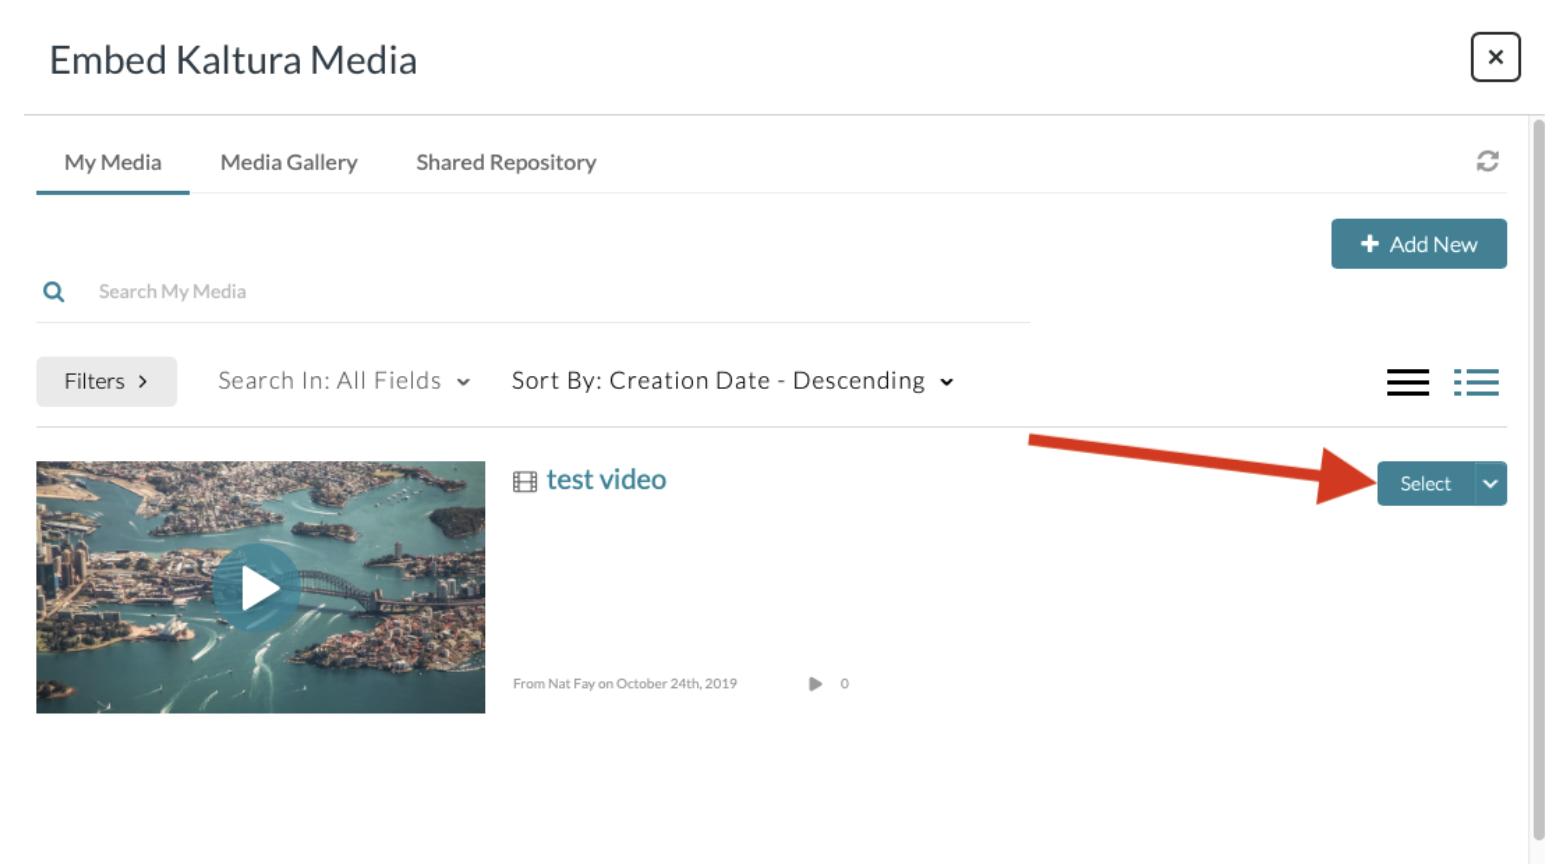 Screenshot of select option when embedding Kaltura media in Canvas